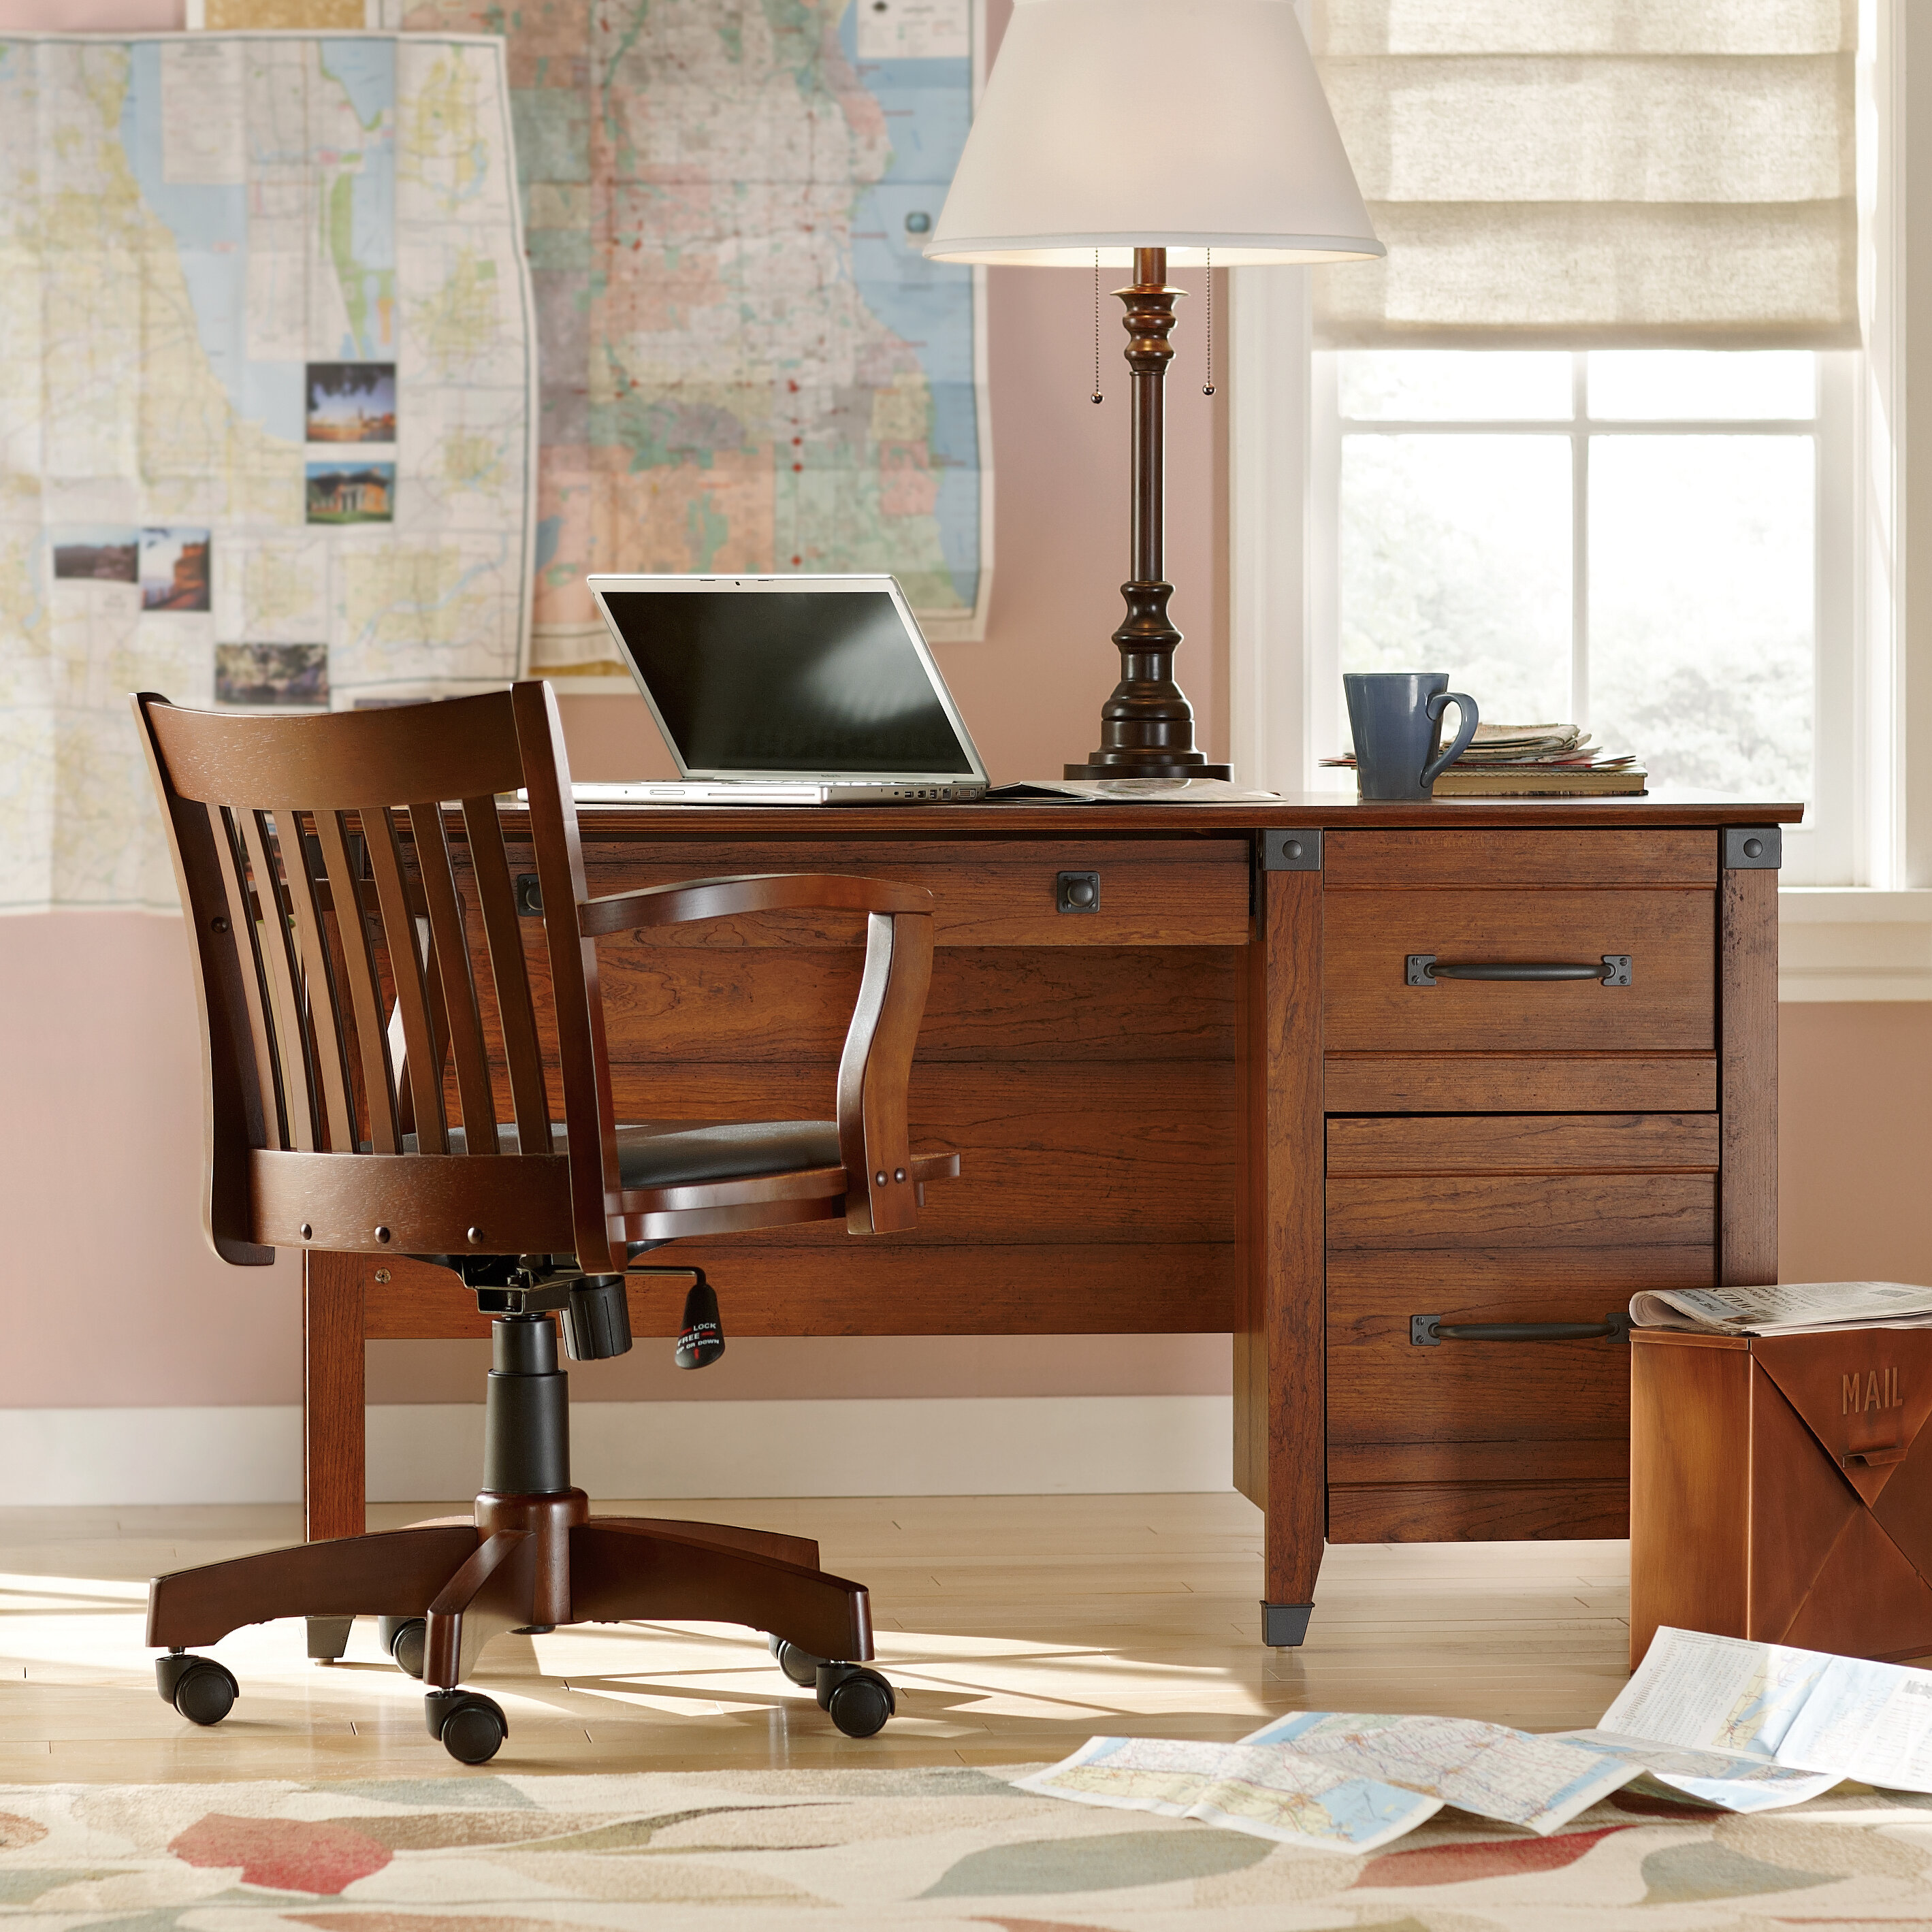 office computer furniture. Office Computer Furniture